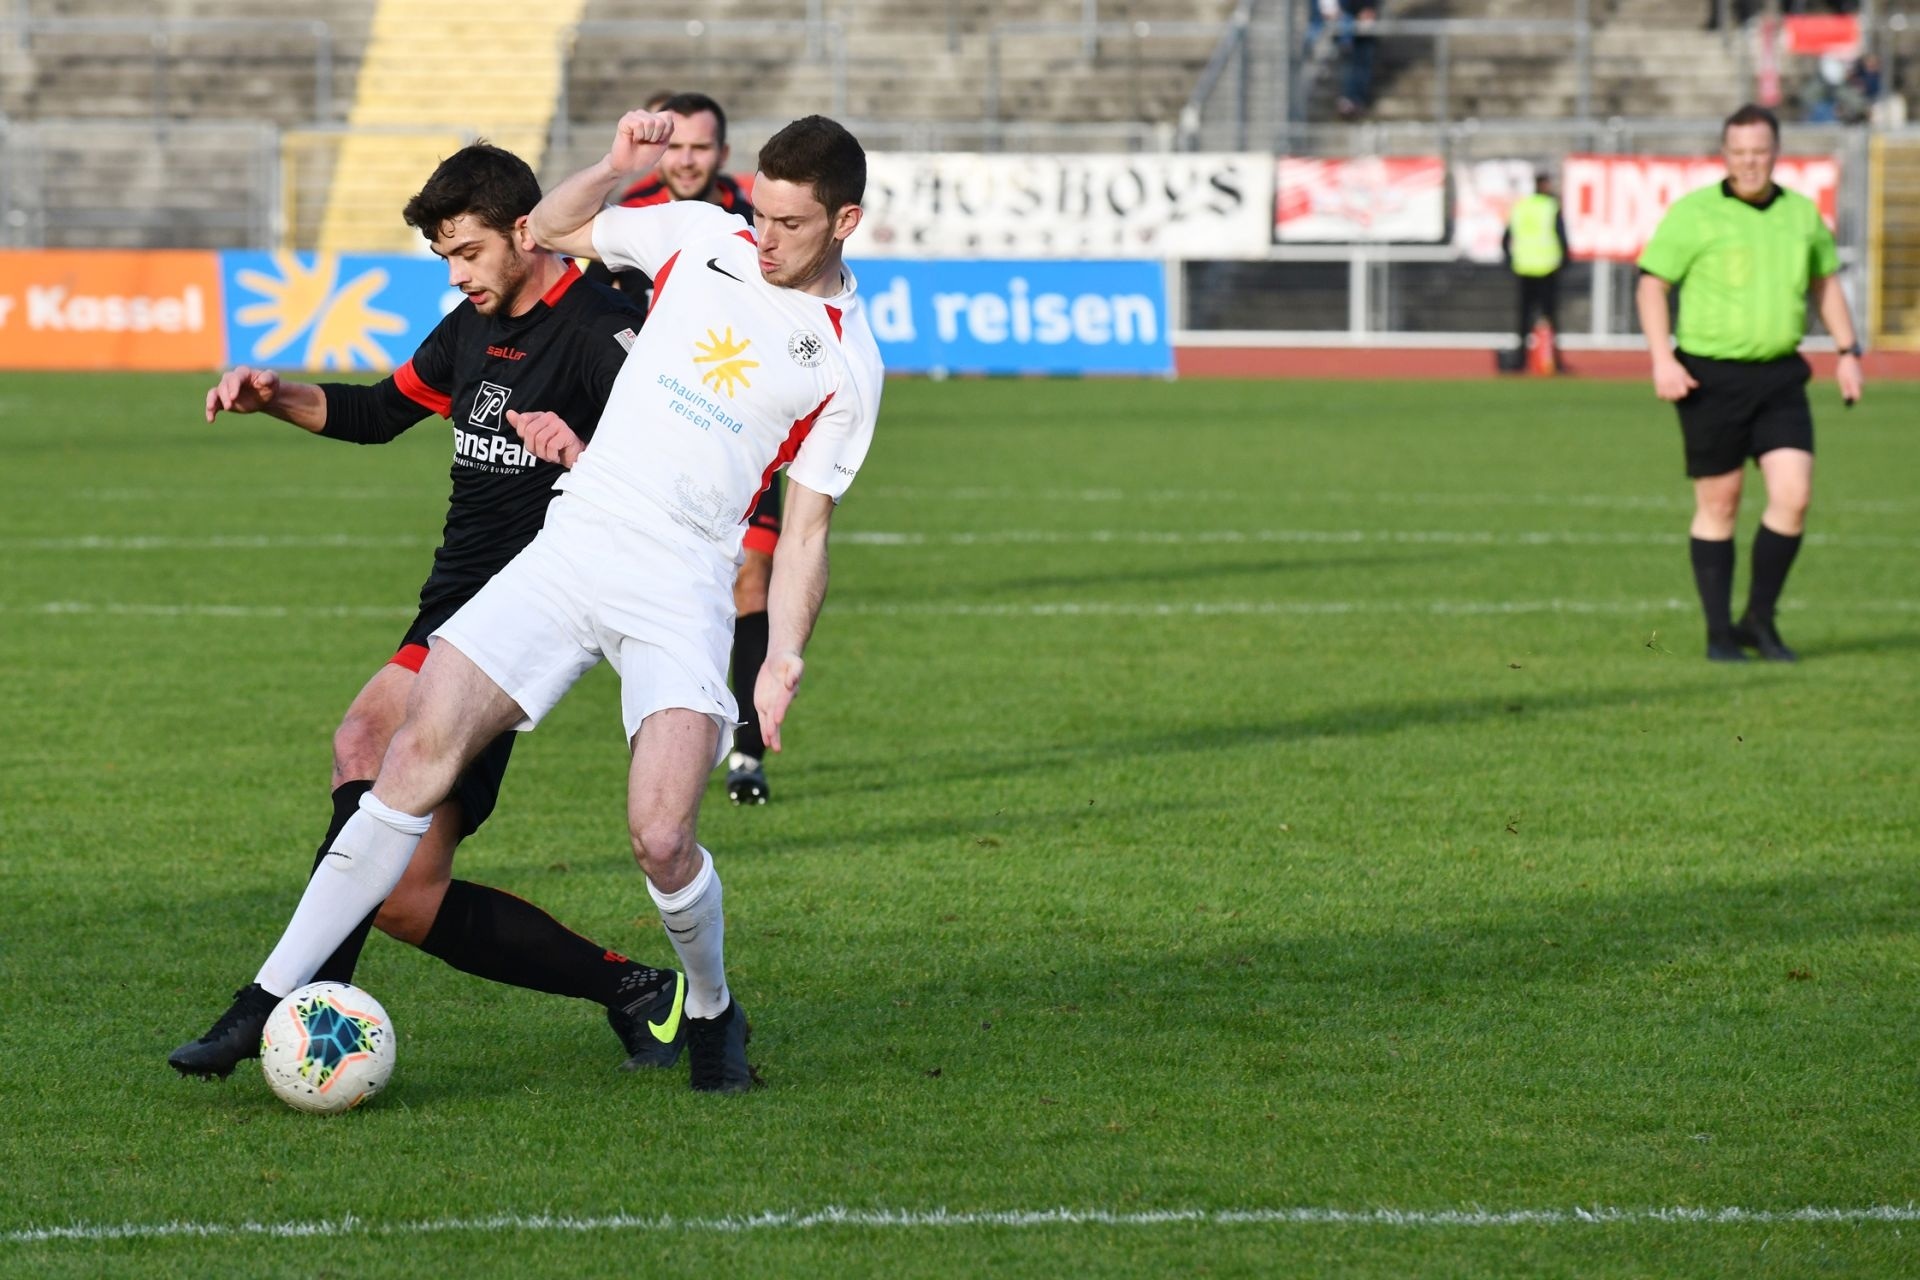 Lotto Hessenliga 2019/2020, KSV Hessen Kassel, SC Waldgirmes, Endstand 4:1, Lukas Iksal (KSV Hessen Kassel)